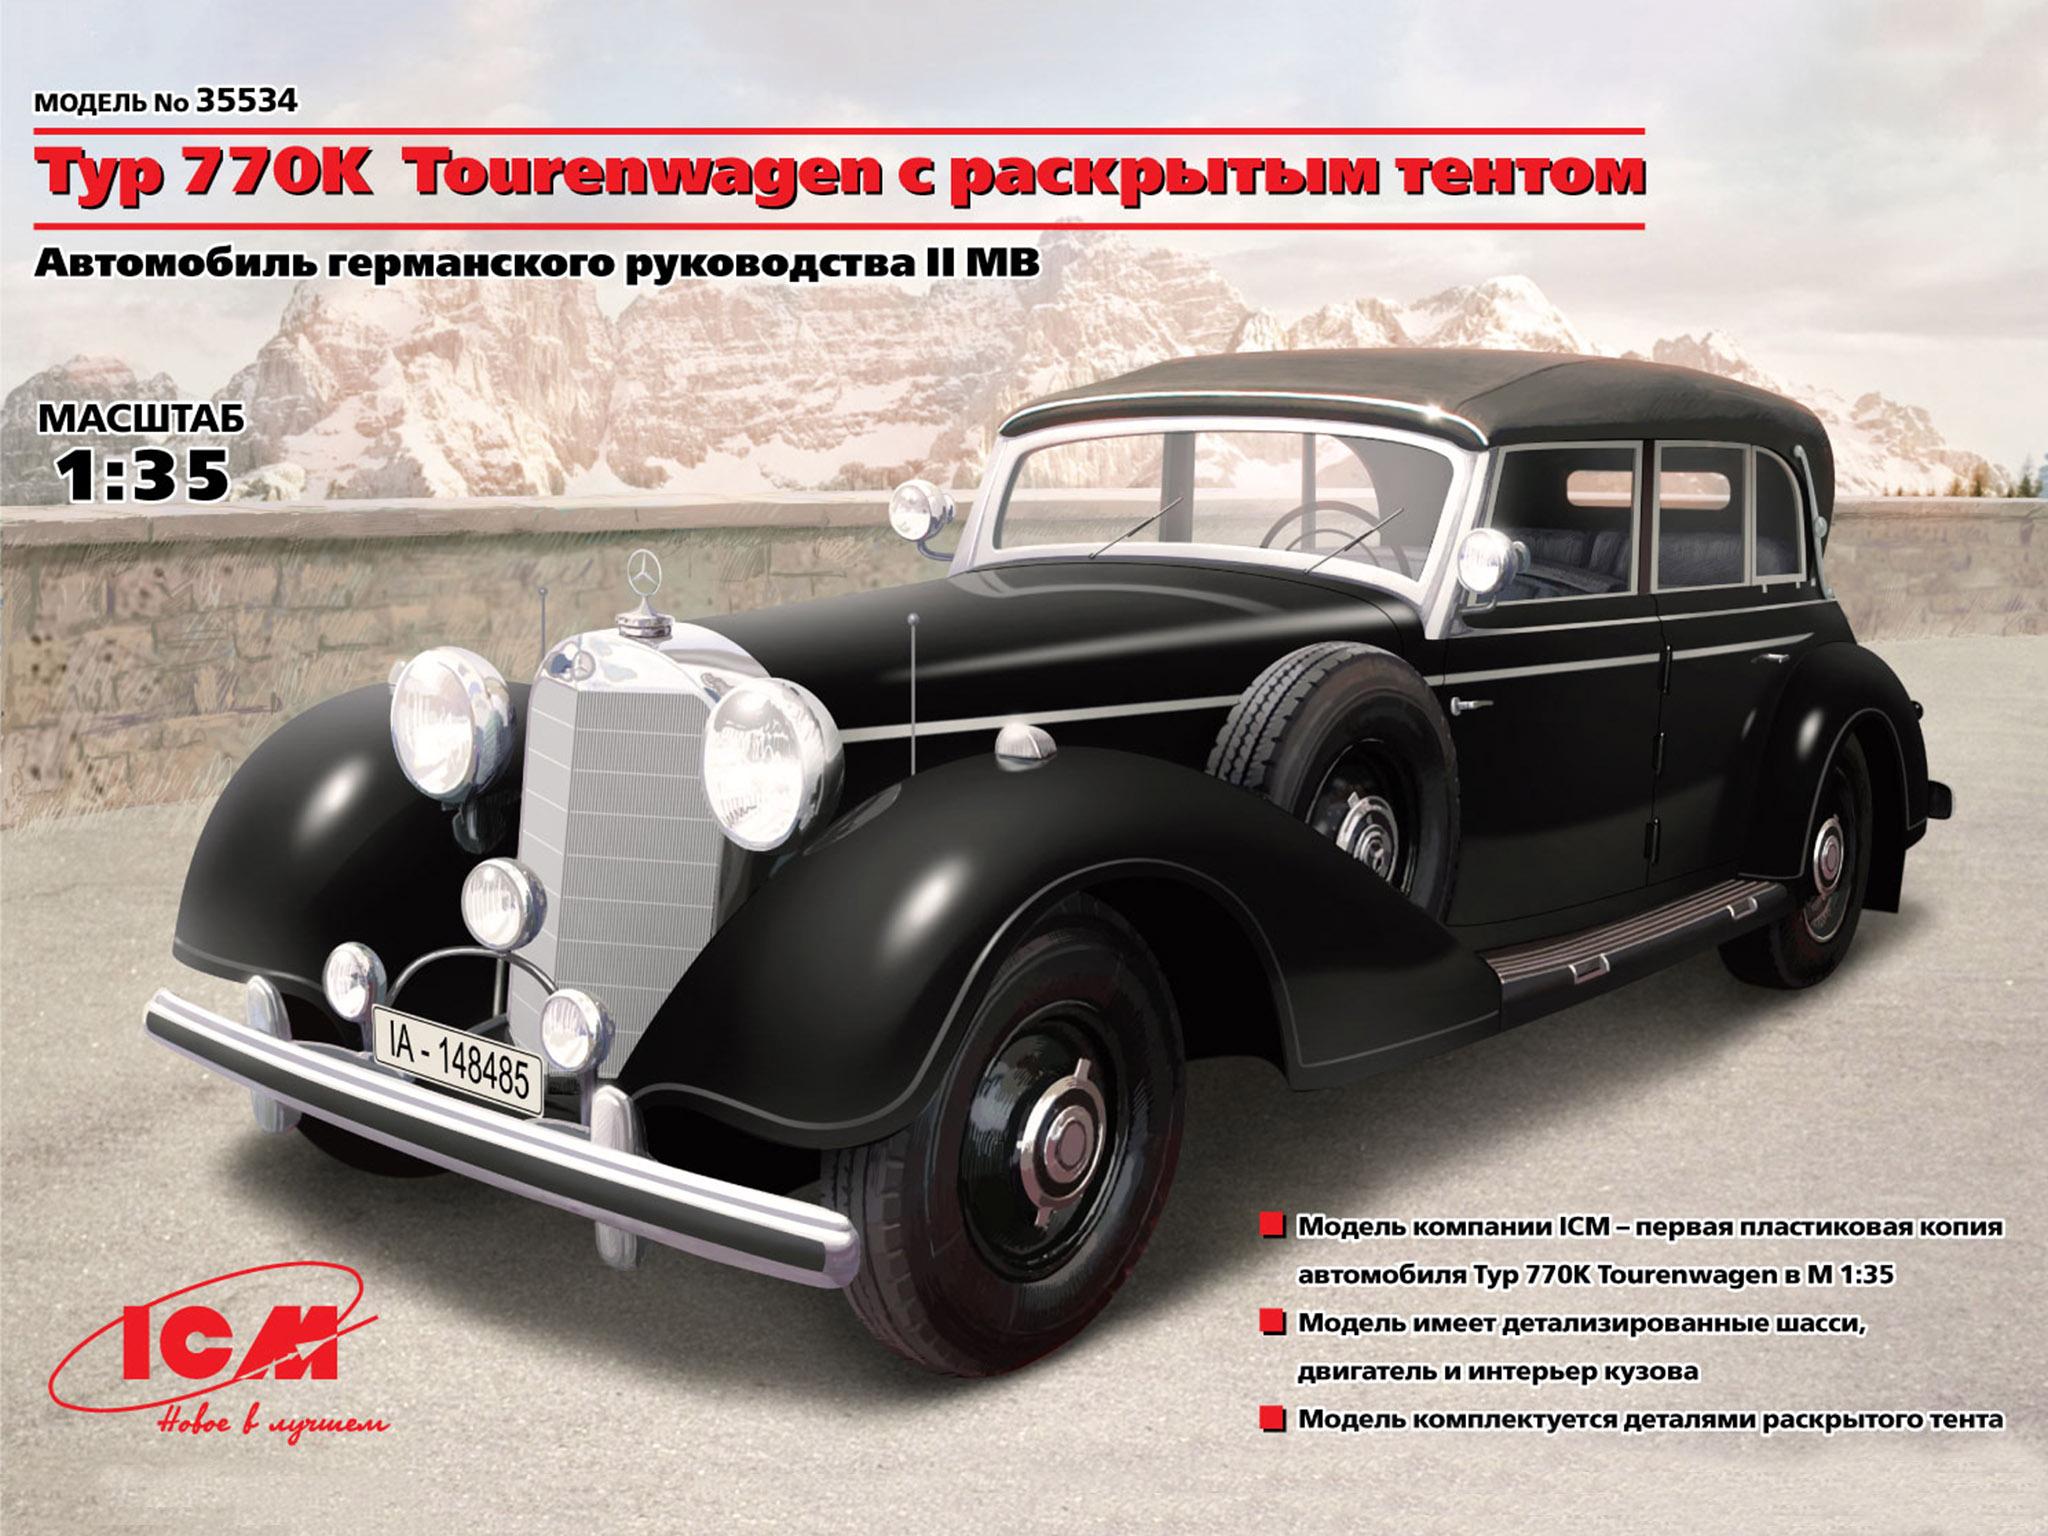 1374829842_35534_web_ru-4